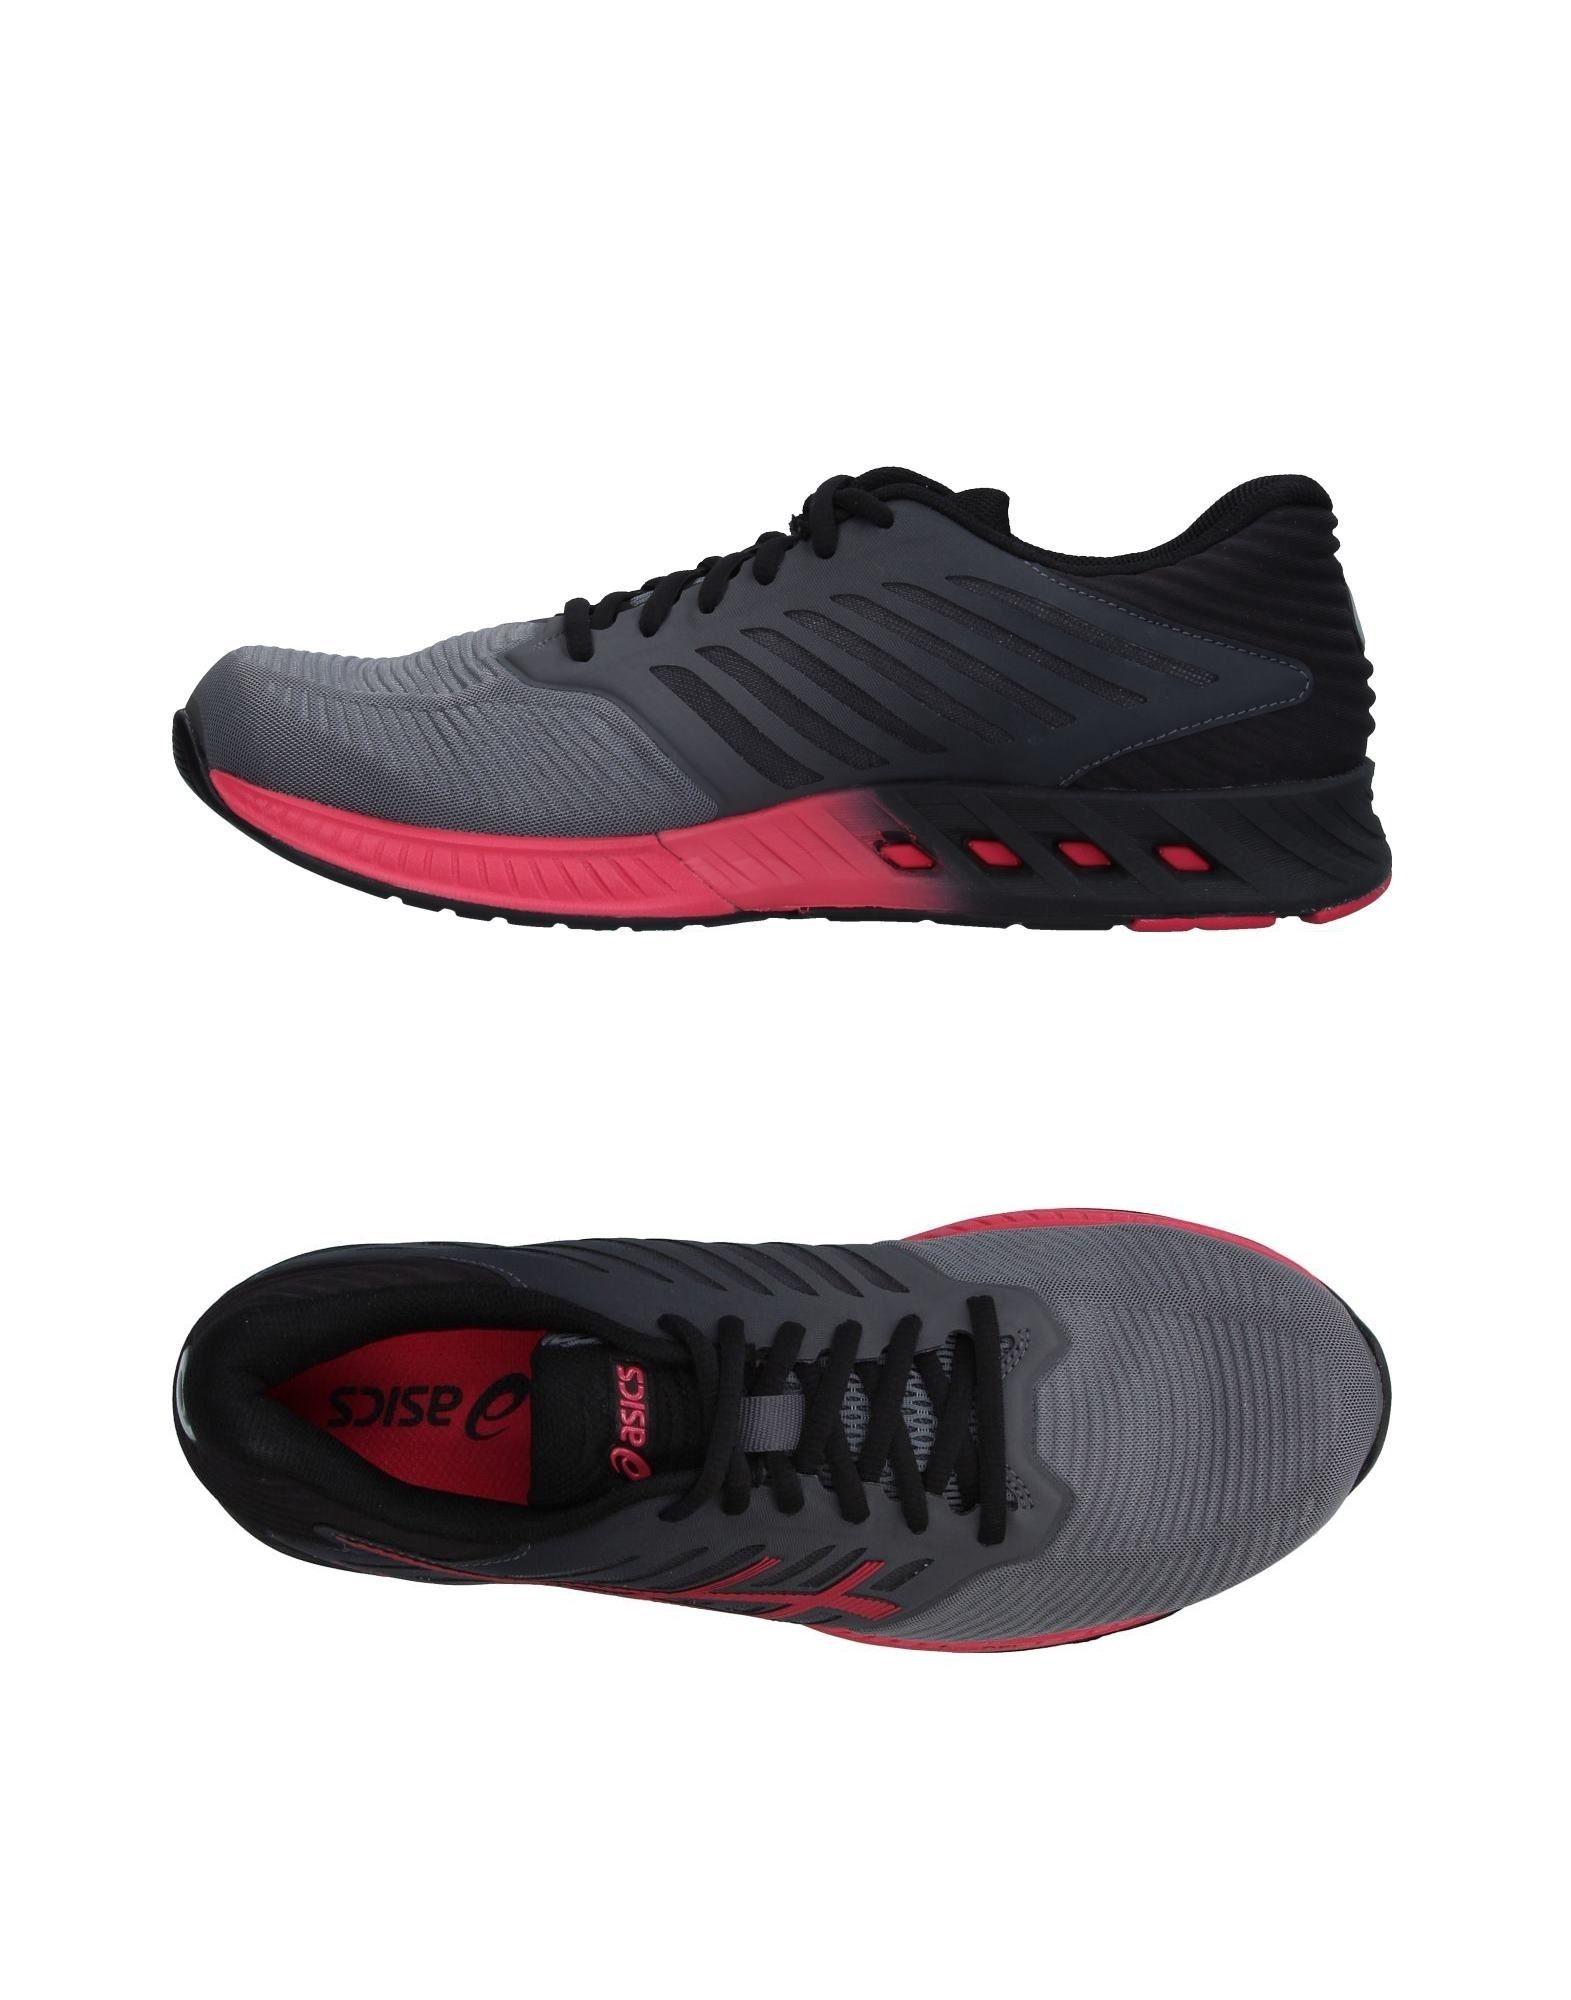 Moda barata y hermosa Asics Zapatillas Asics hermosa Mujer - Zapatillas Asics  Gris c39a7e